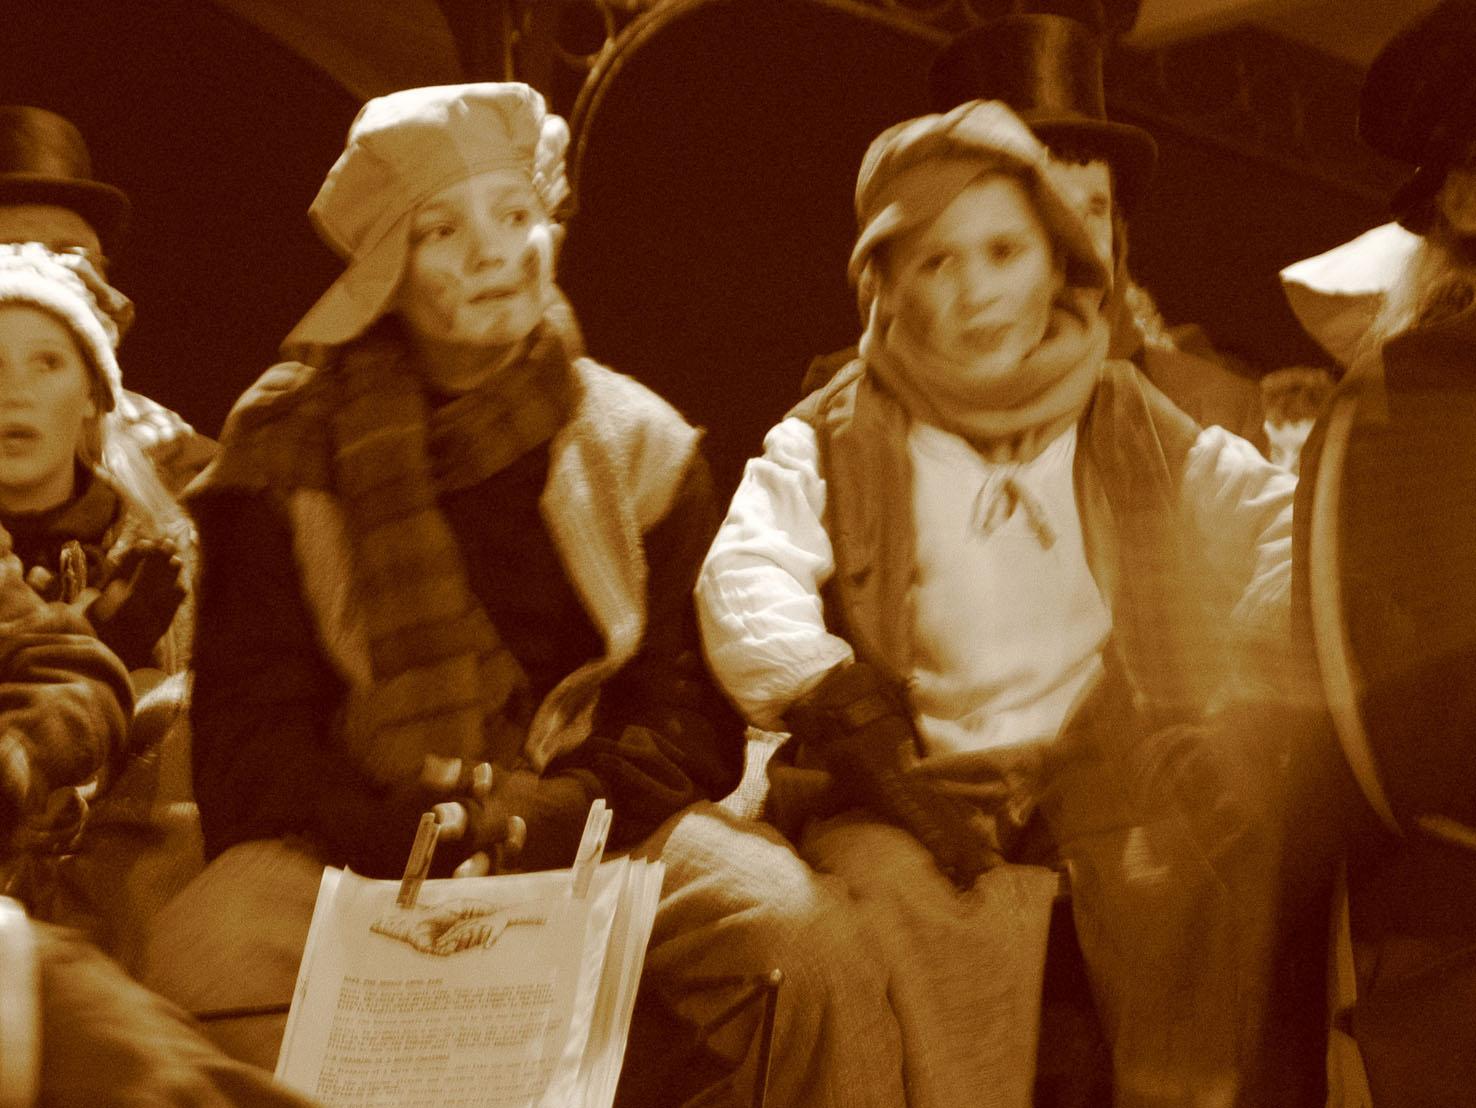 108 - Kerstmarkt Helmond 2003.jpg